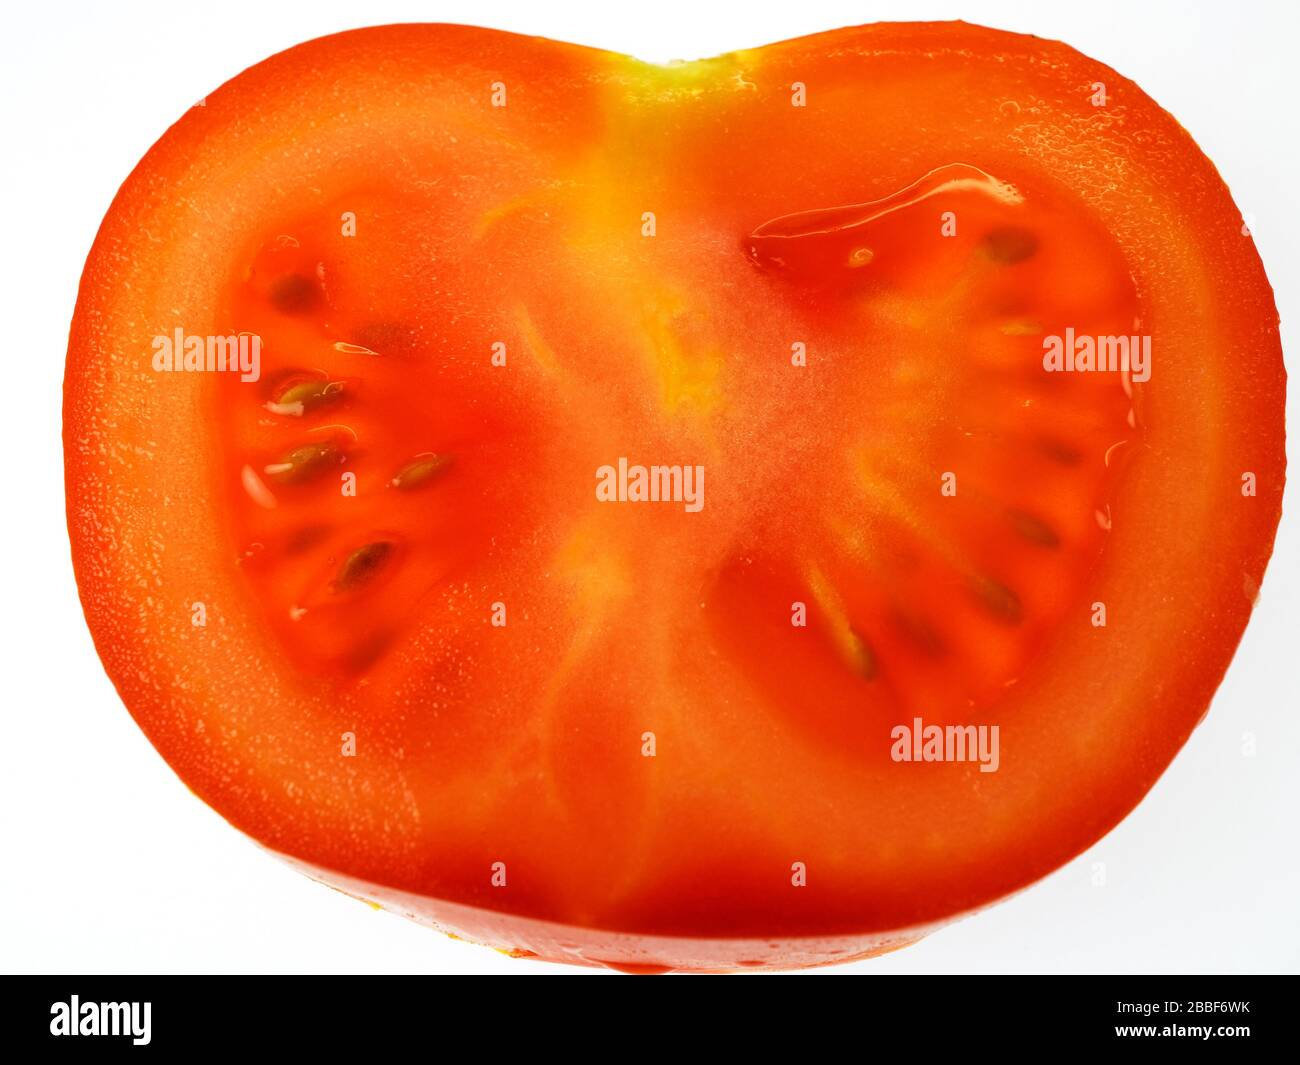 A single ripe red tomato slice on a white background Stock Photo